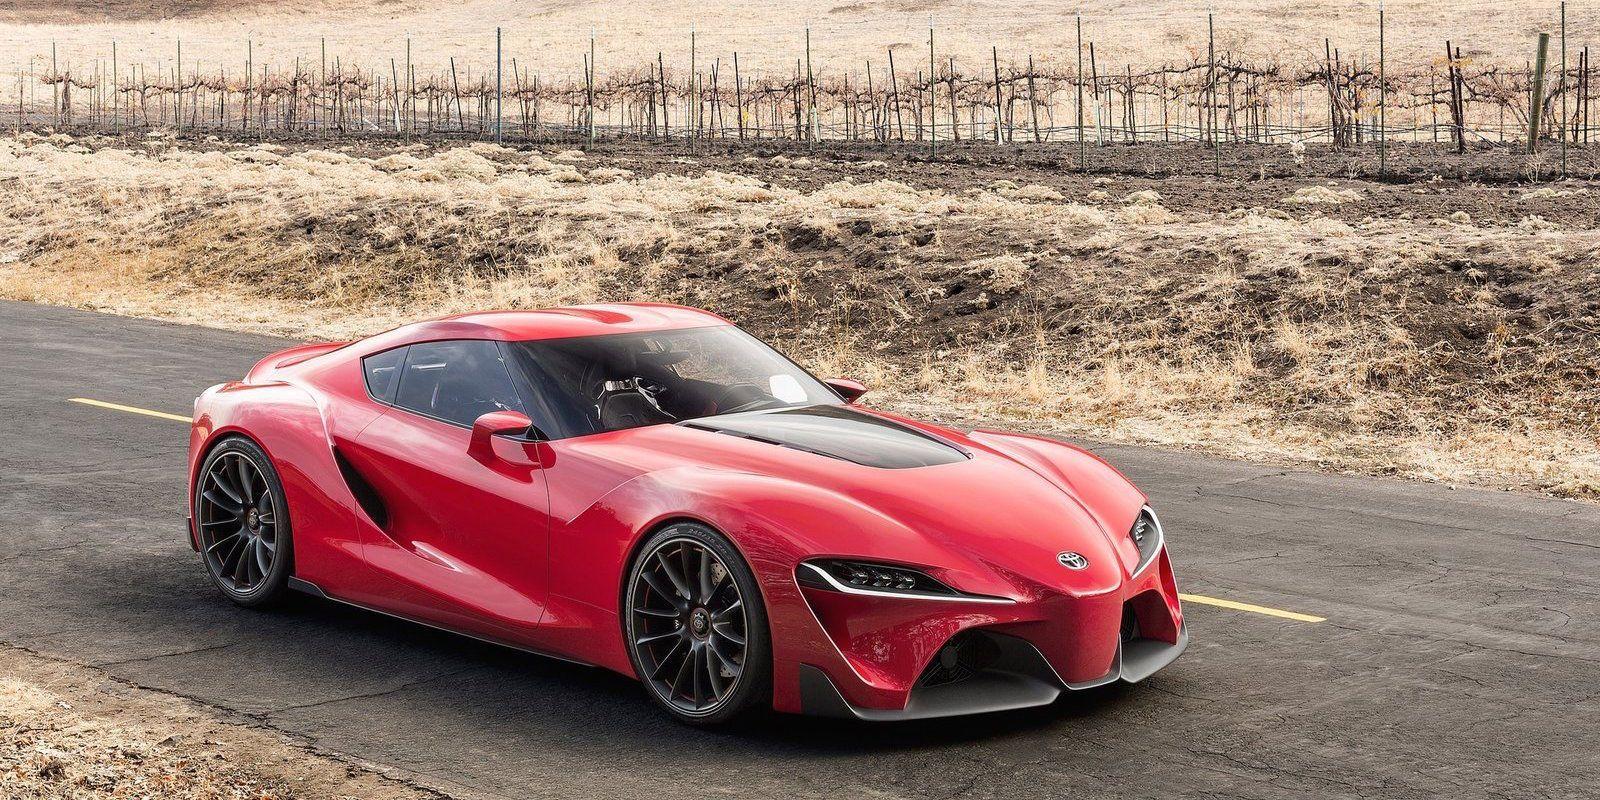 Bmw Toyota Sports Car Collaboration Starts Production In 2018 New Toyota Supra Sports Car Toyota Cars